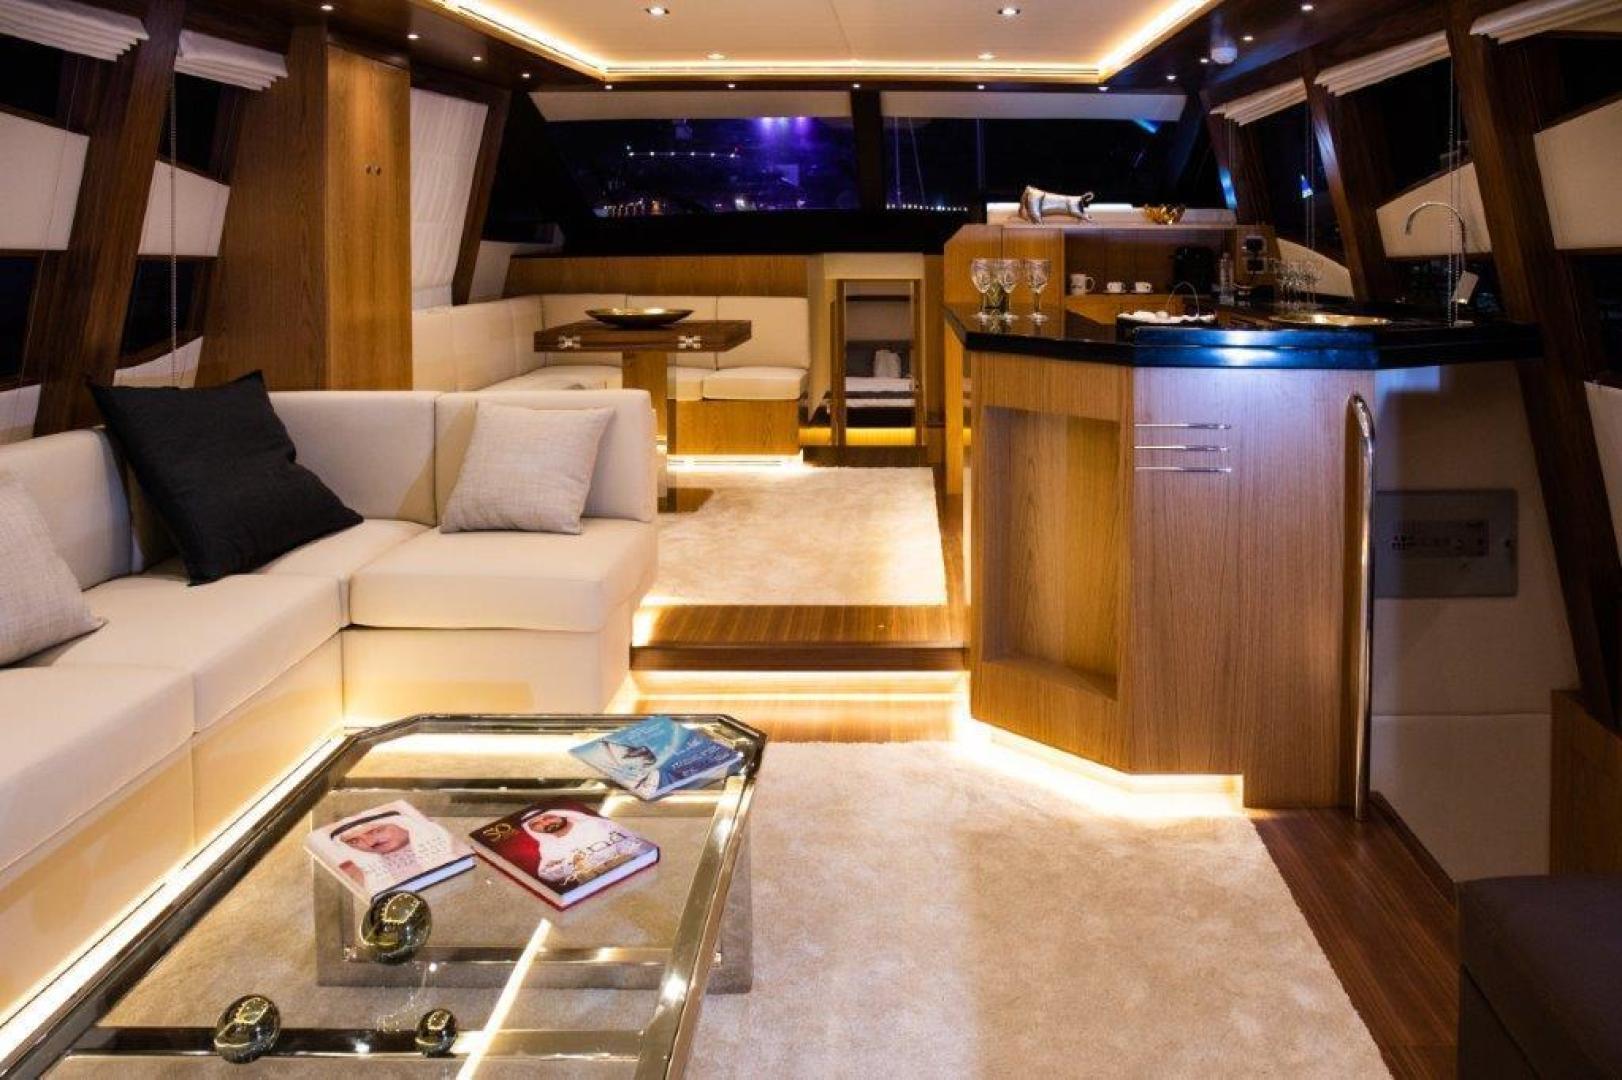 Riviera-Hull #1 2019-INTEGRITY Dubai-United Arab Emirates-Salon-1323151 | Thumbnail